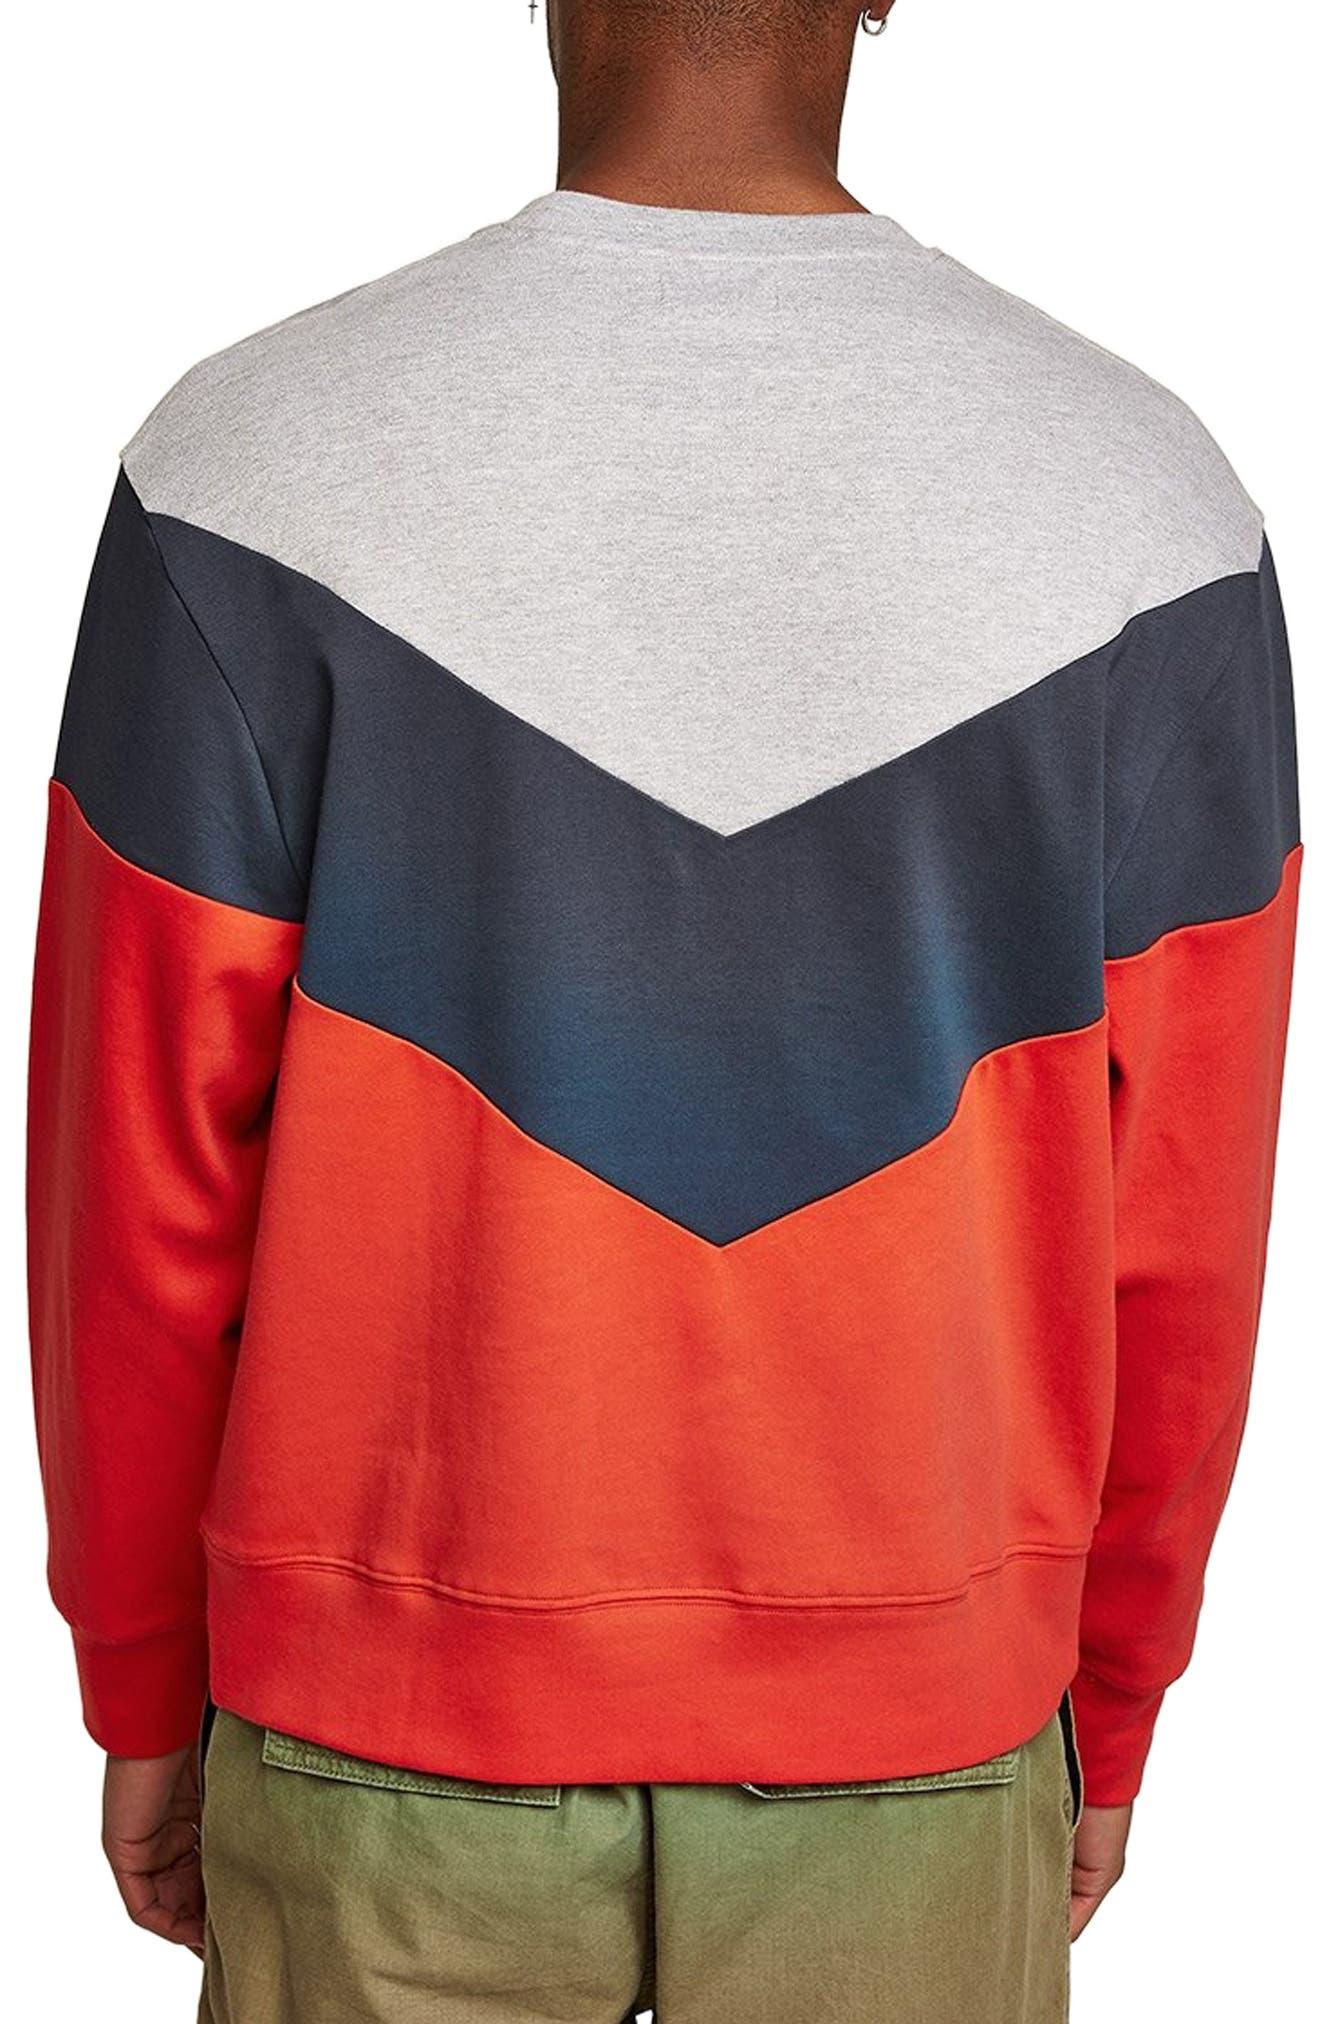 Chevron Colorblock Sweatshirt,                             Alternate thumbnail 2, color,                             RED MULTI